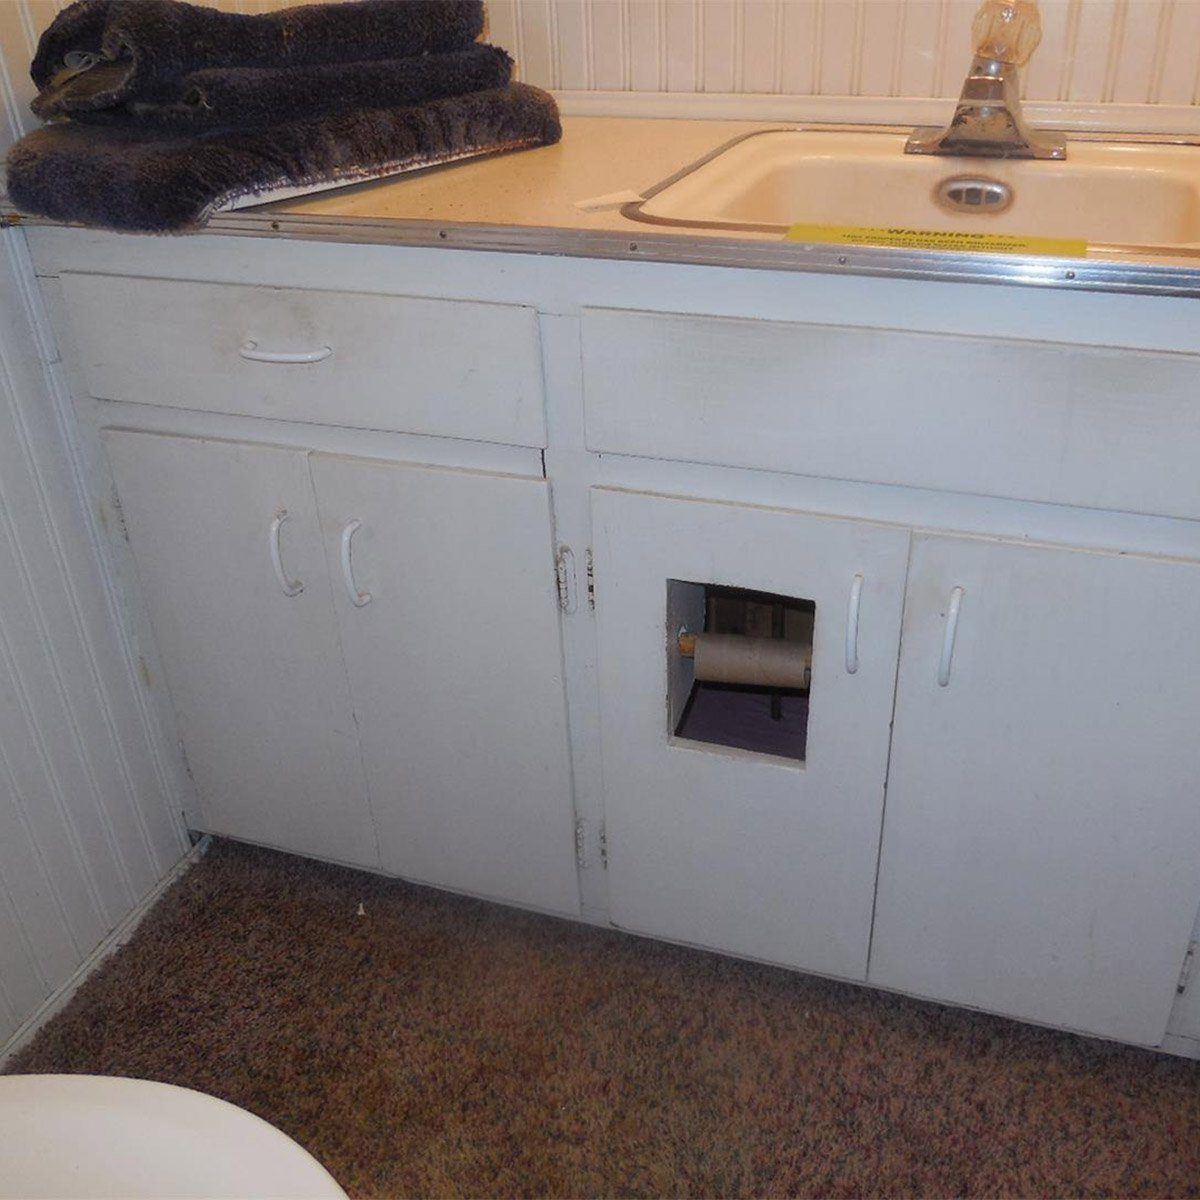 toilet paper holder in cabinet